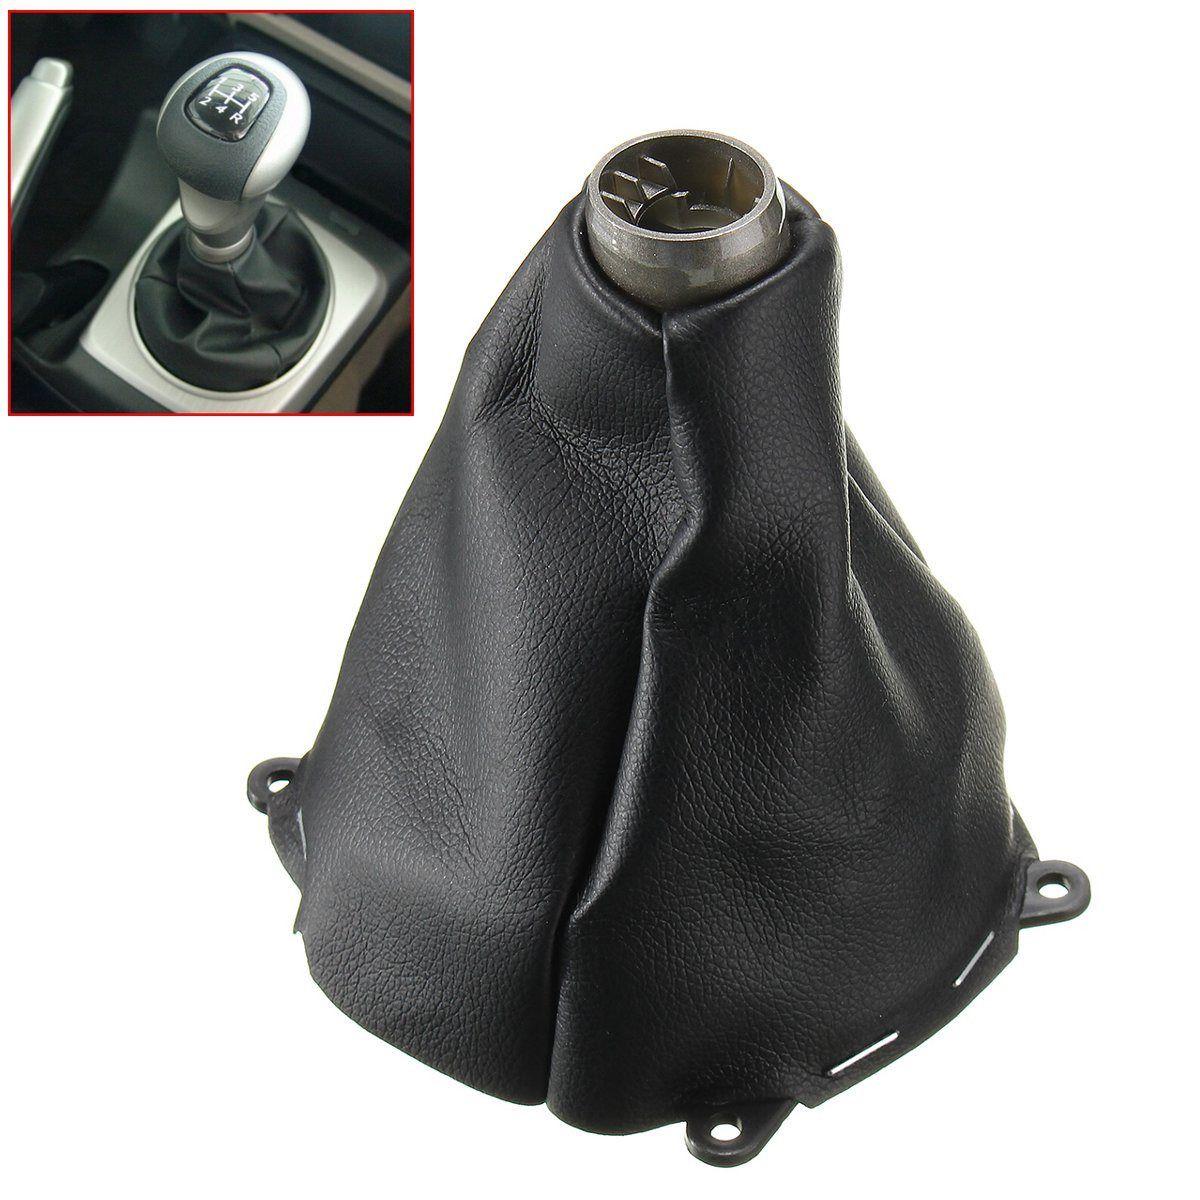 Car Manual Leather Gear Gaiter Shift Shifter Boot For Honda for Civic Si 2006 2007 2008 2009 2010 2011 Black Gear Shift Collars